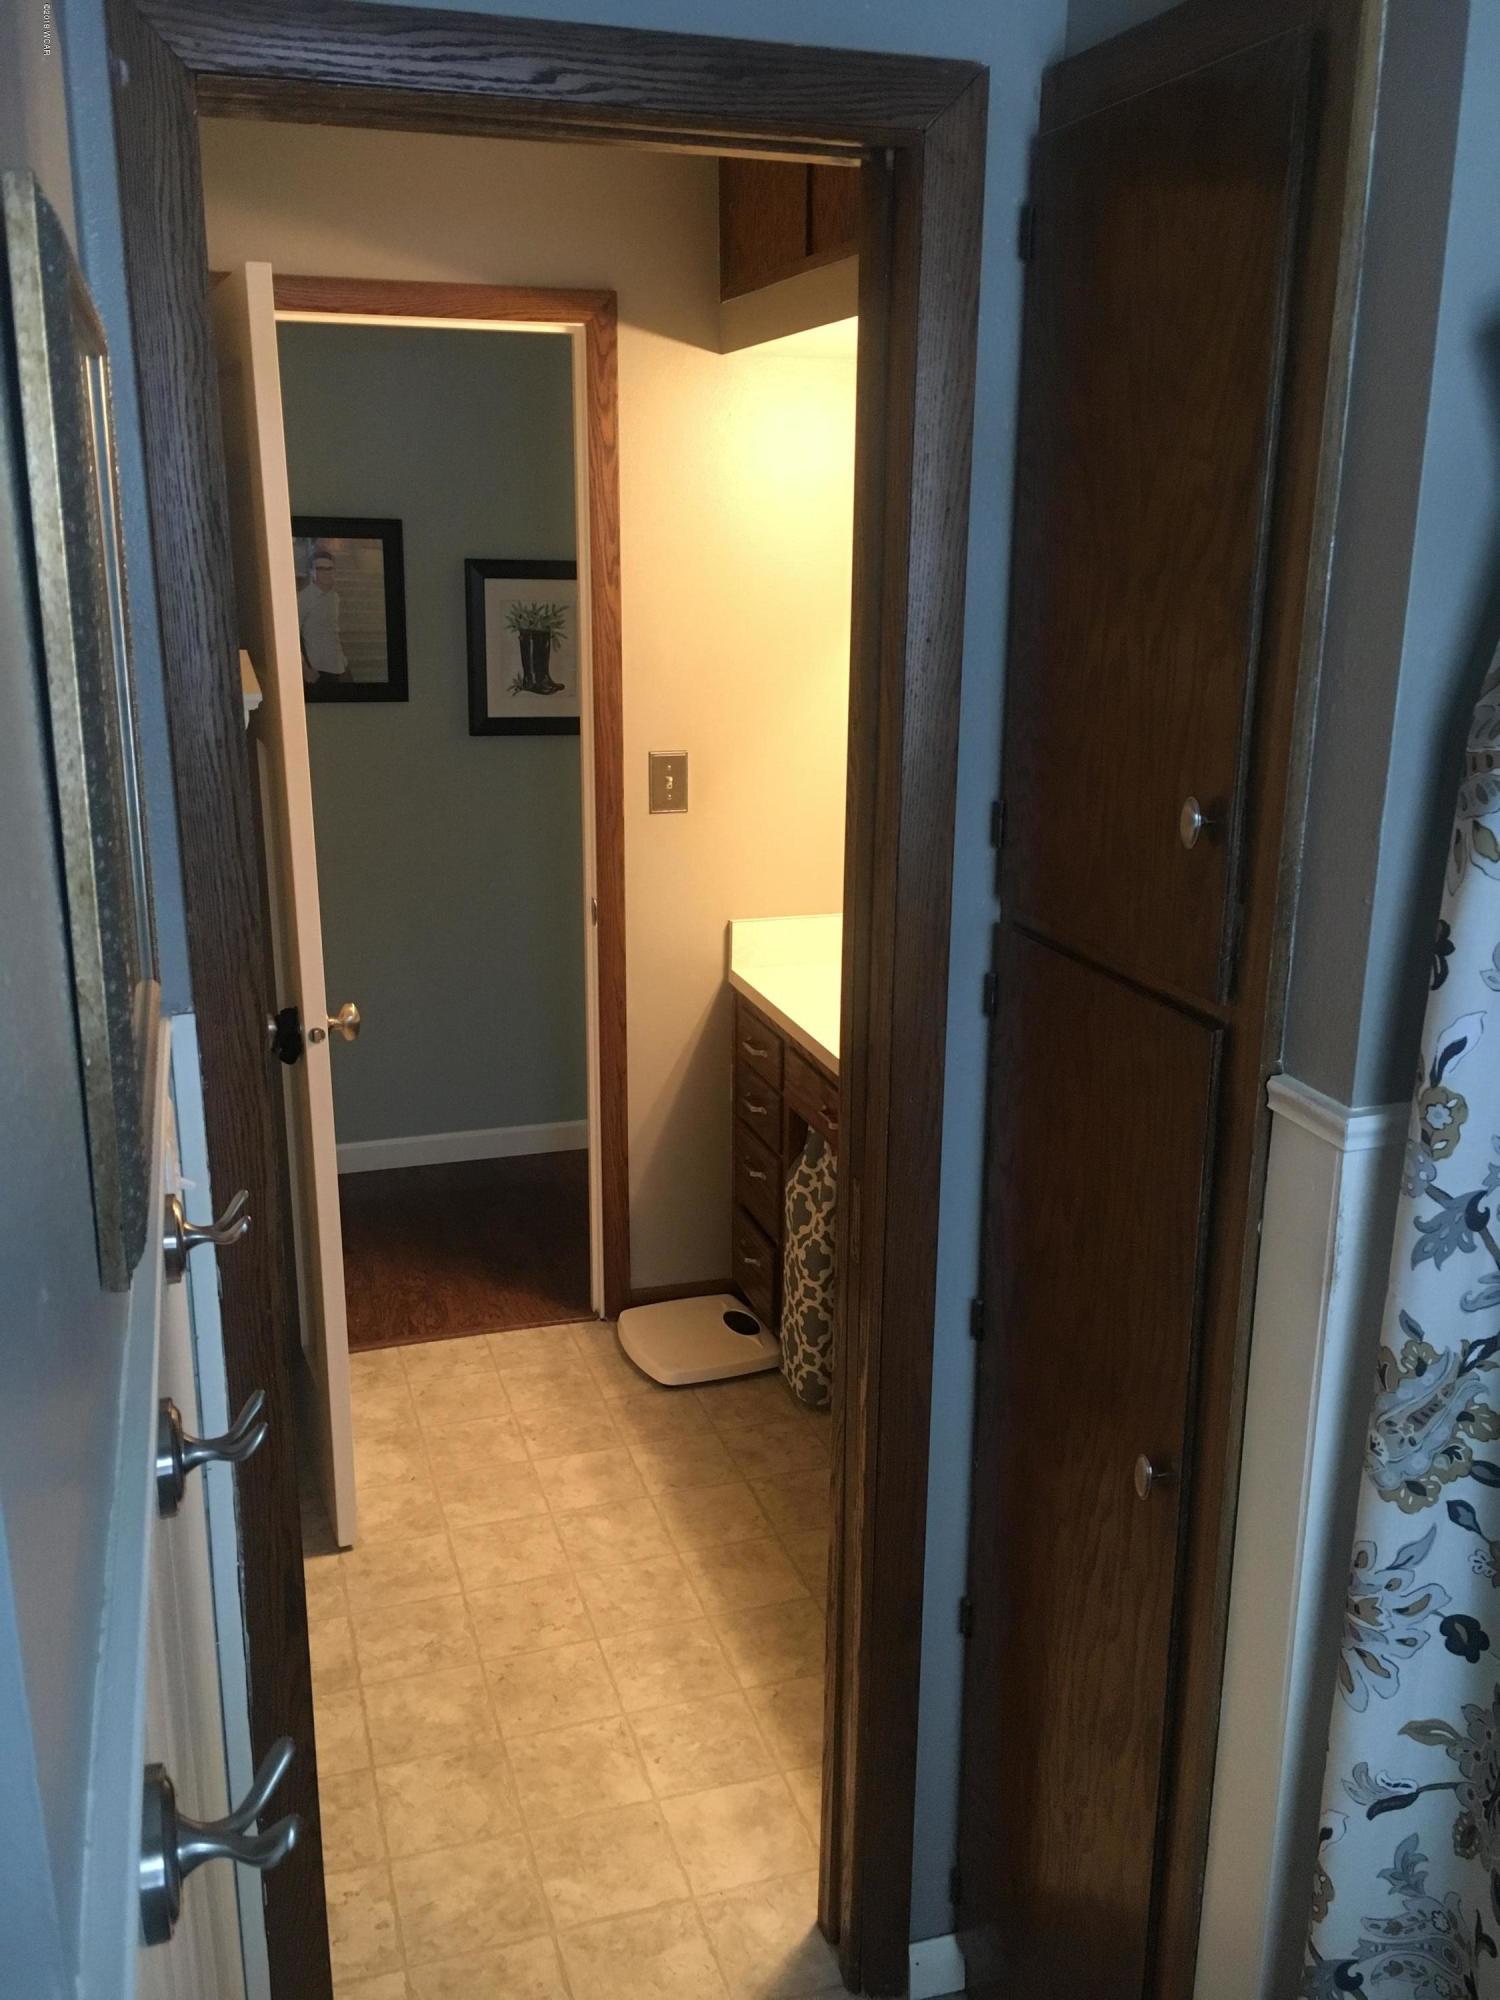 2400 NE Country Club Drive,Willmar,5 Bedrooms Bedrooms,3 BathroomsBathrooms,Single Family,NE Country Club Drive,6033435